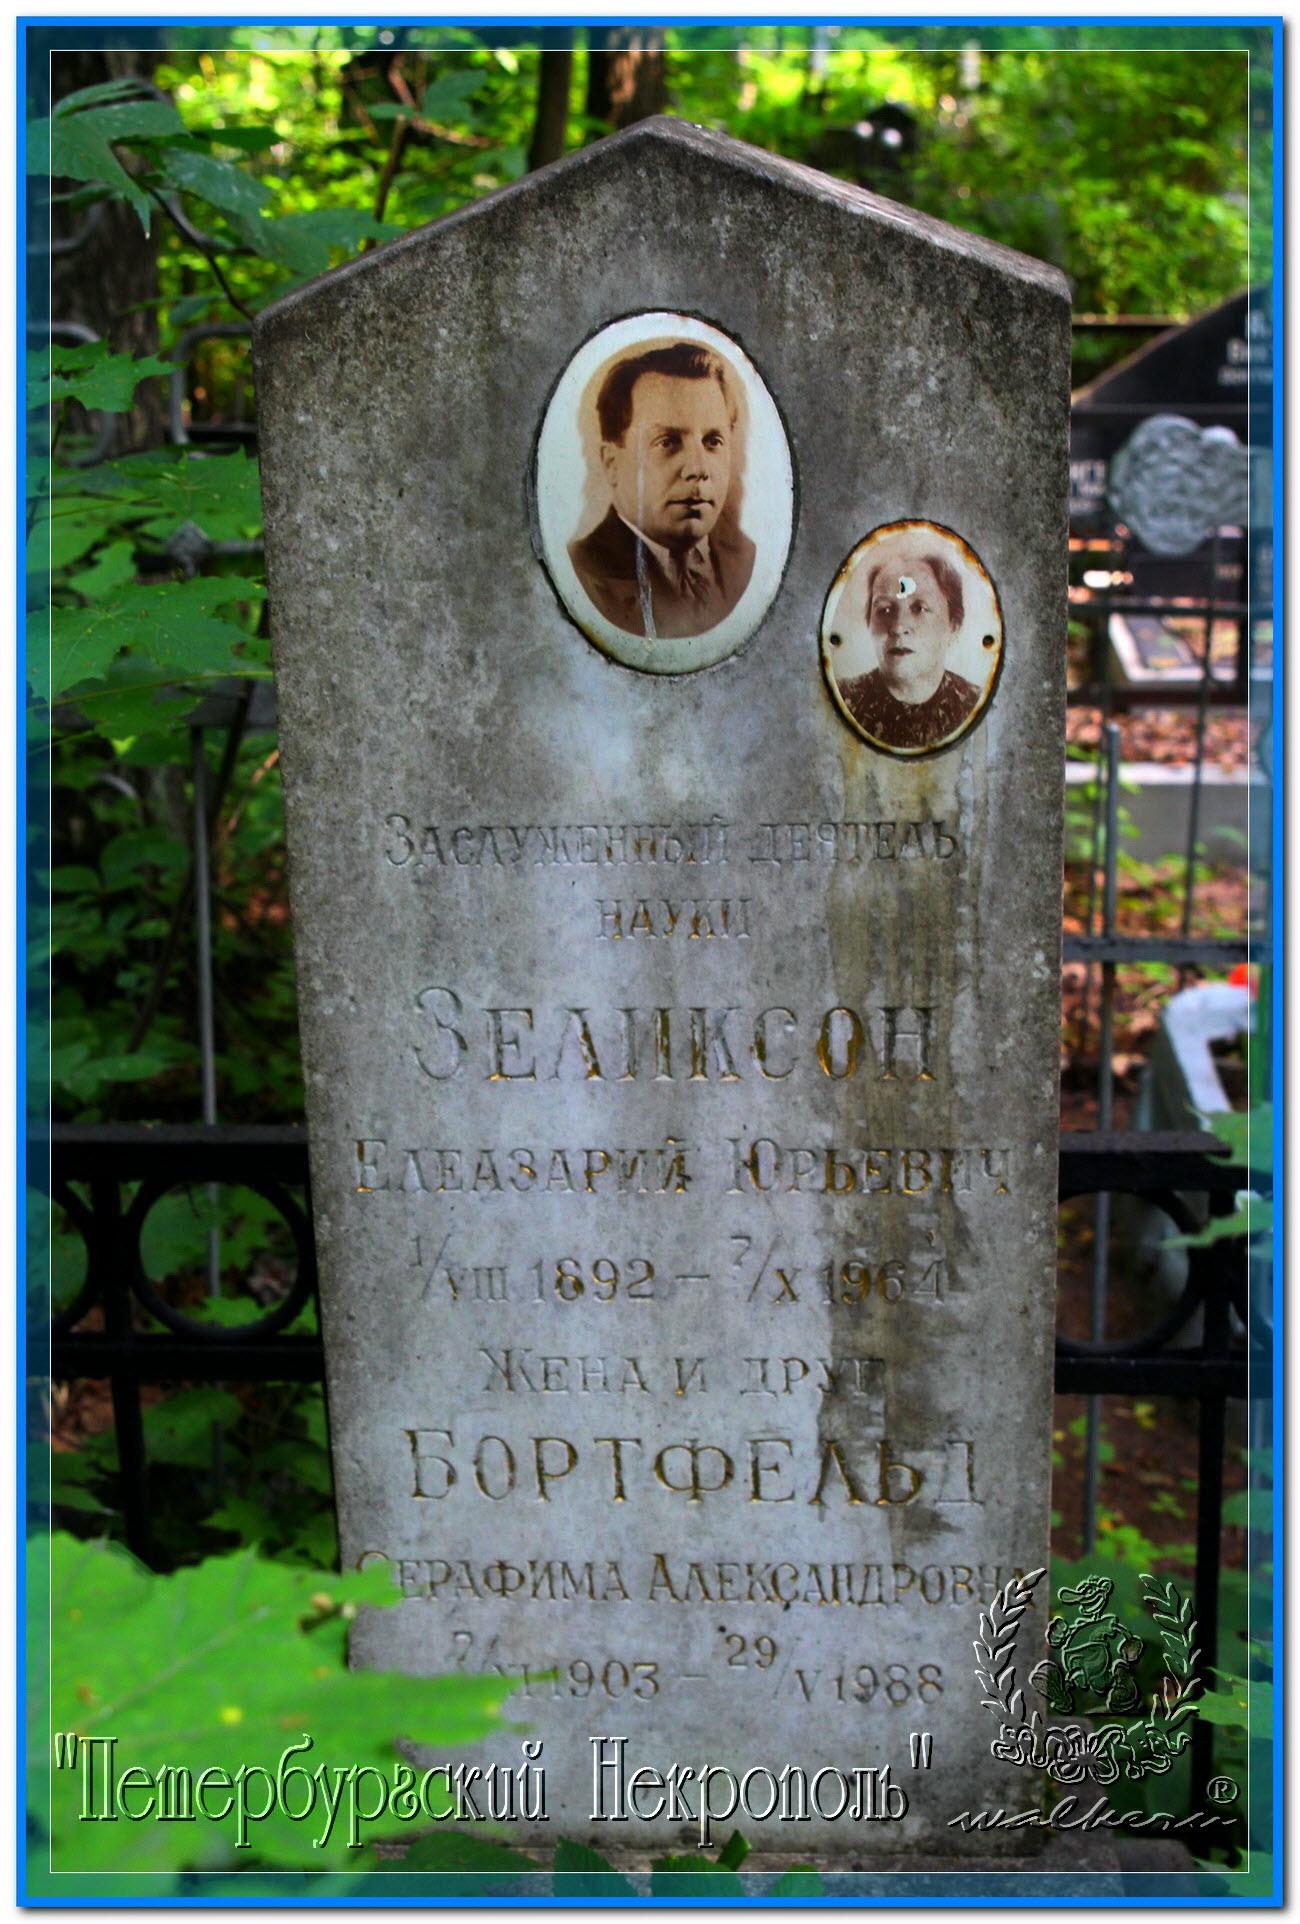 © Зеликсон Елеазарий Юрьевич